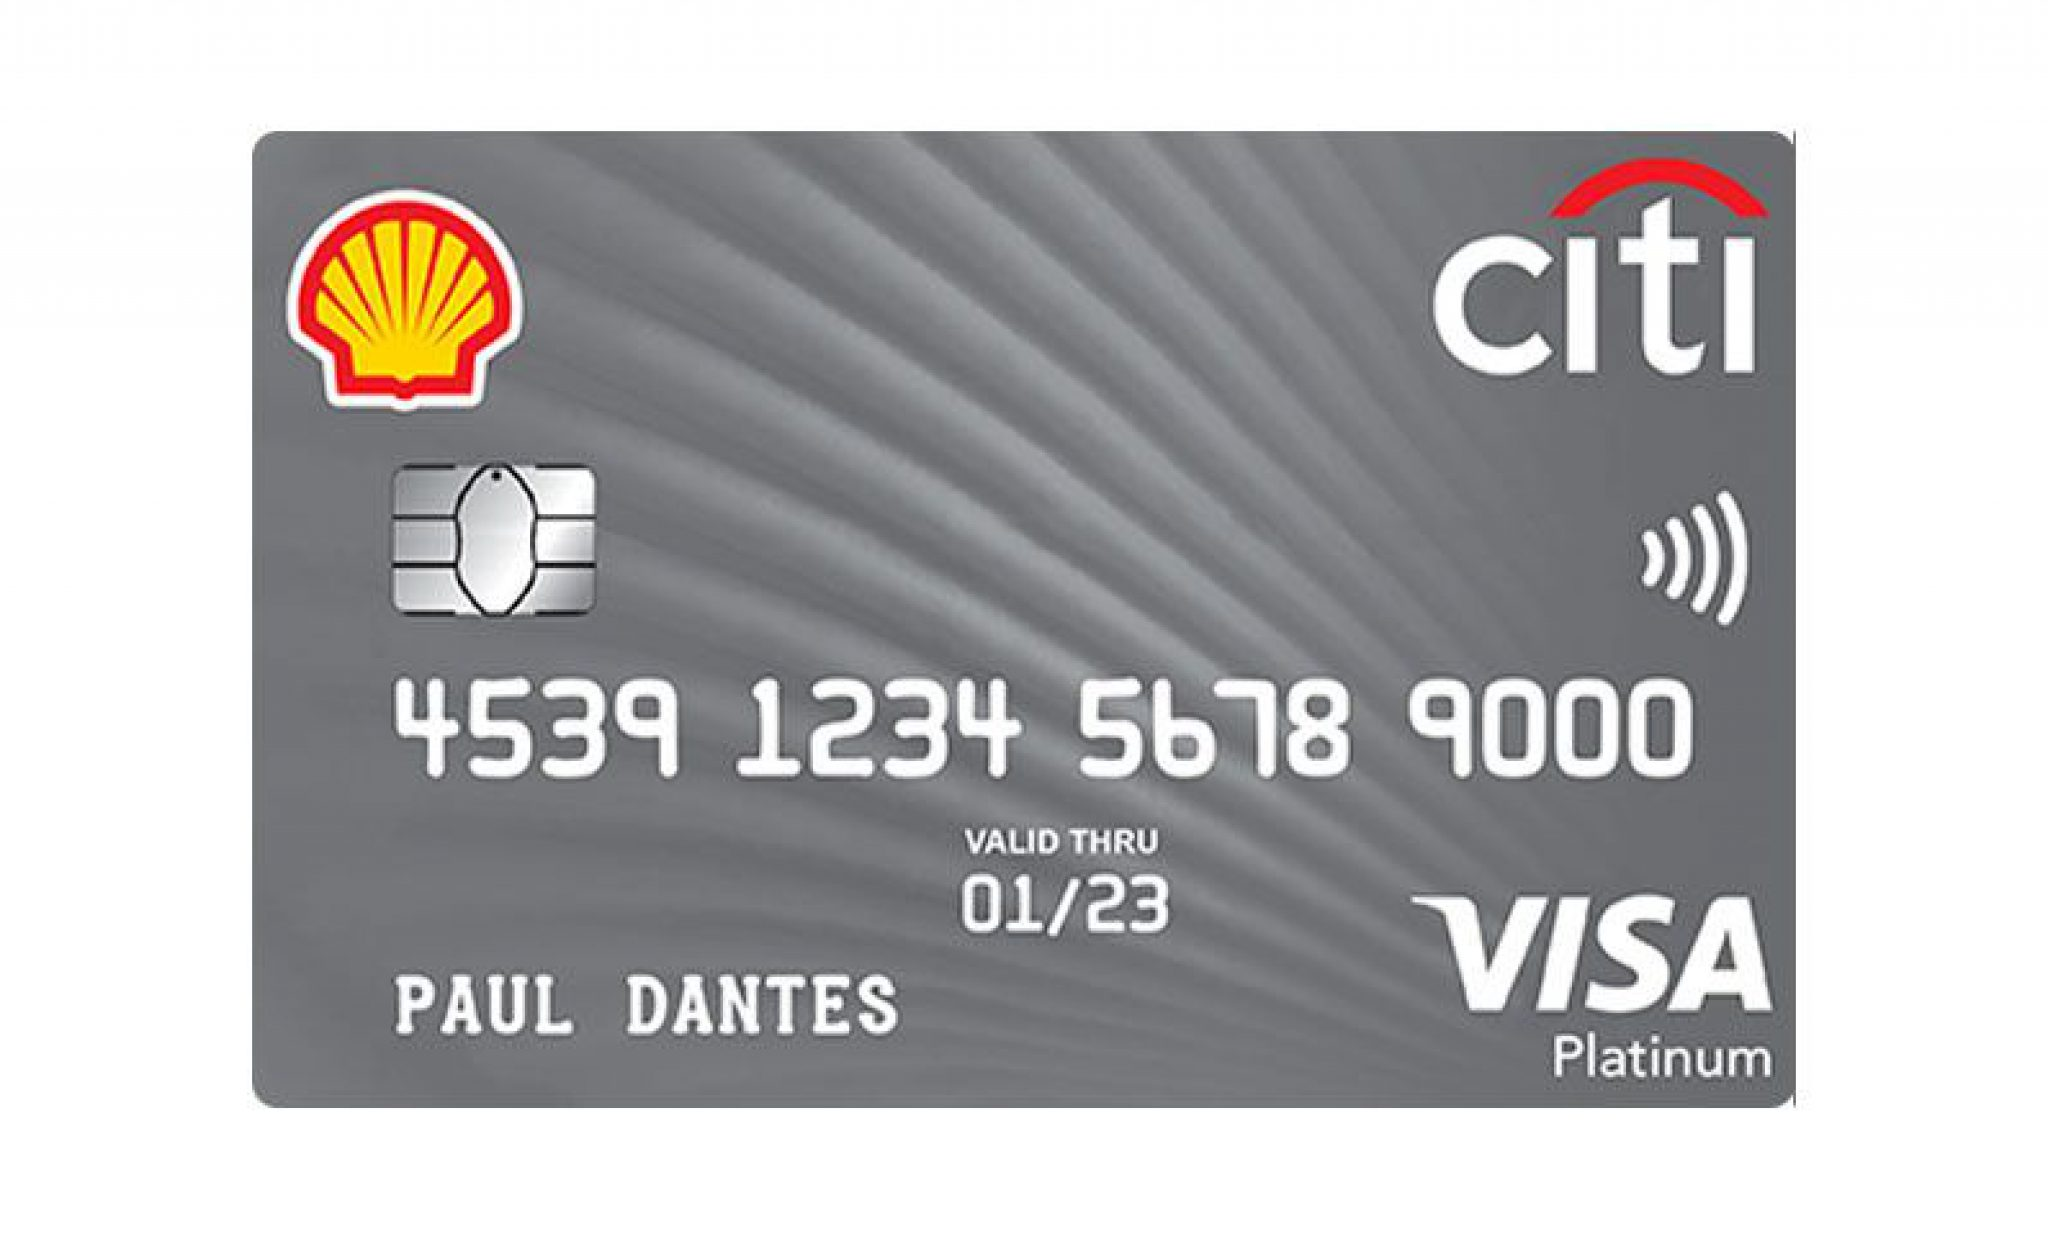 Citi Shell Platinum Visa